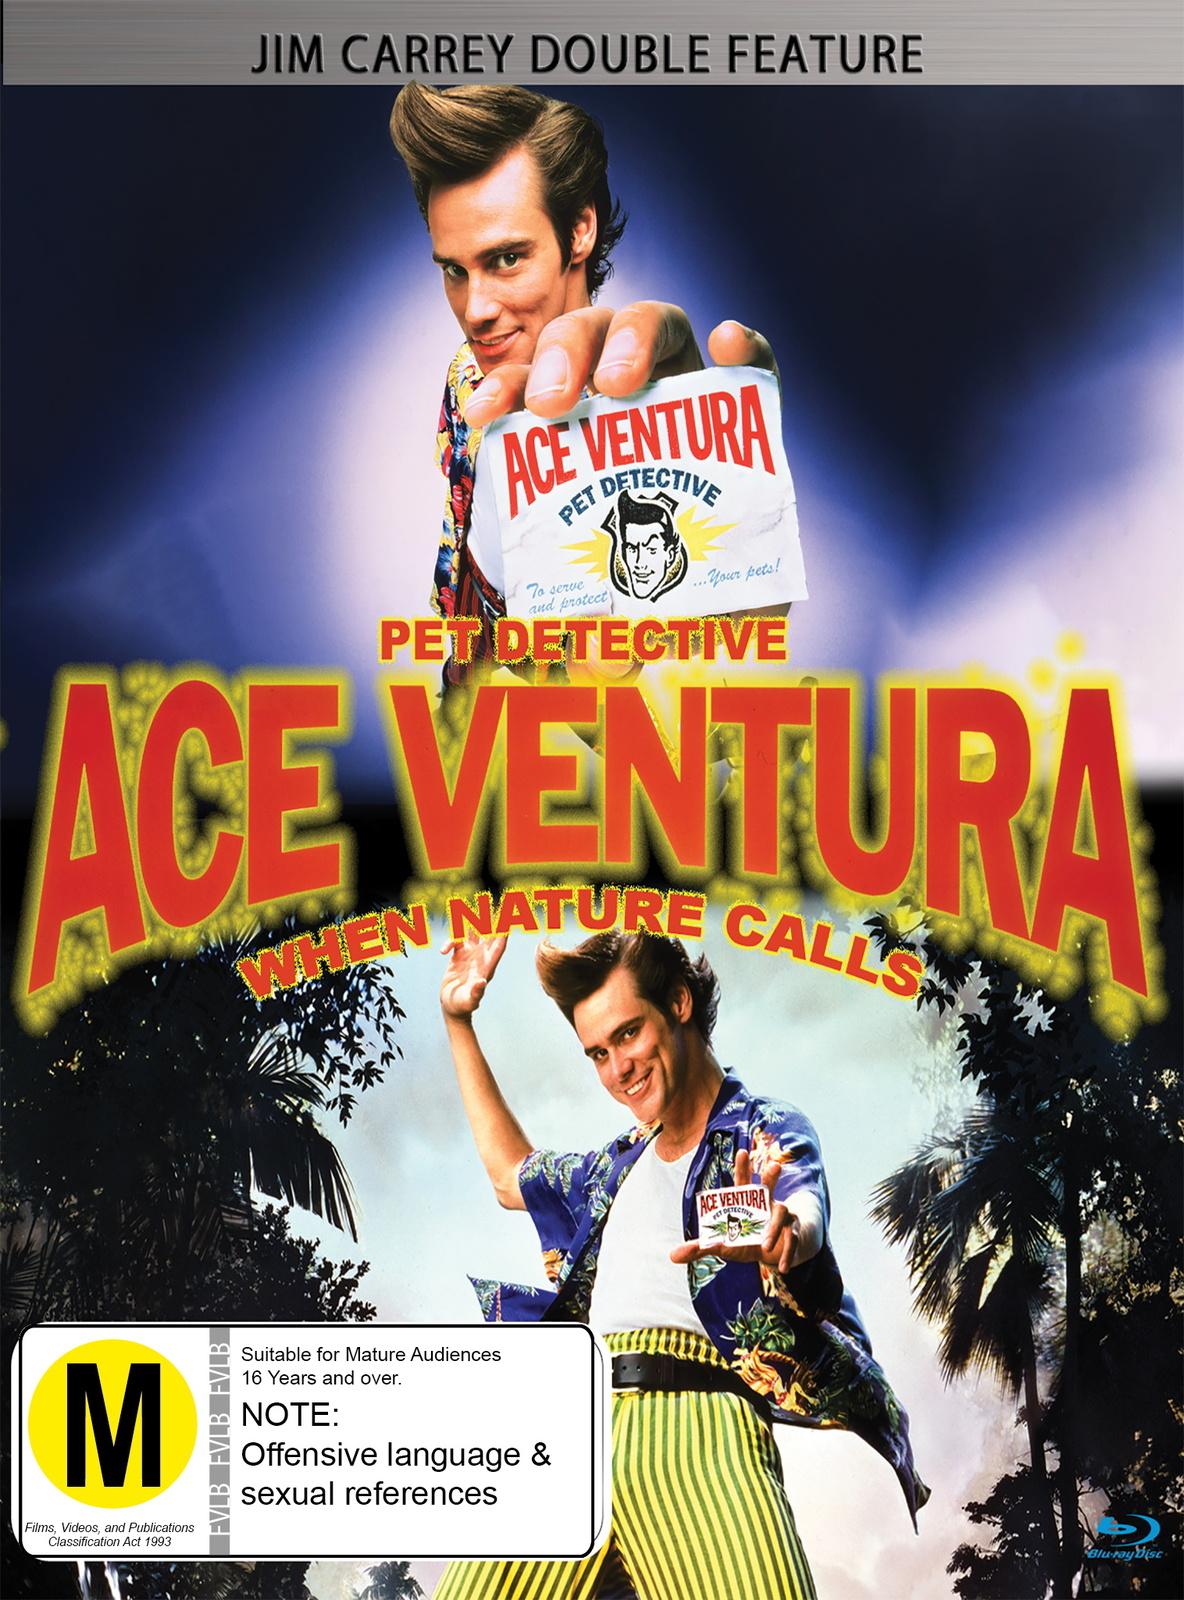 Ace Ventura: Pet Detective/When Nature Calls image